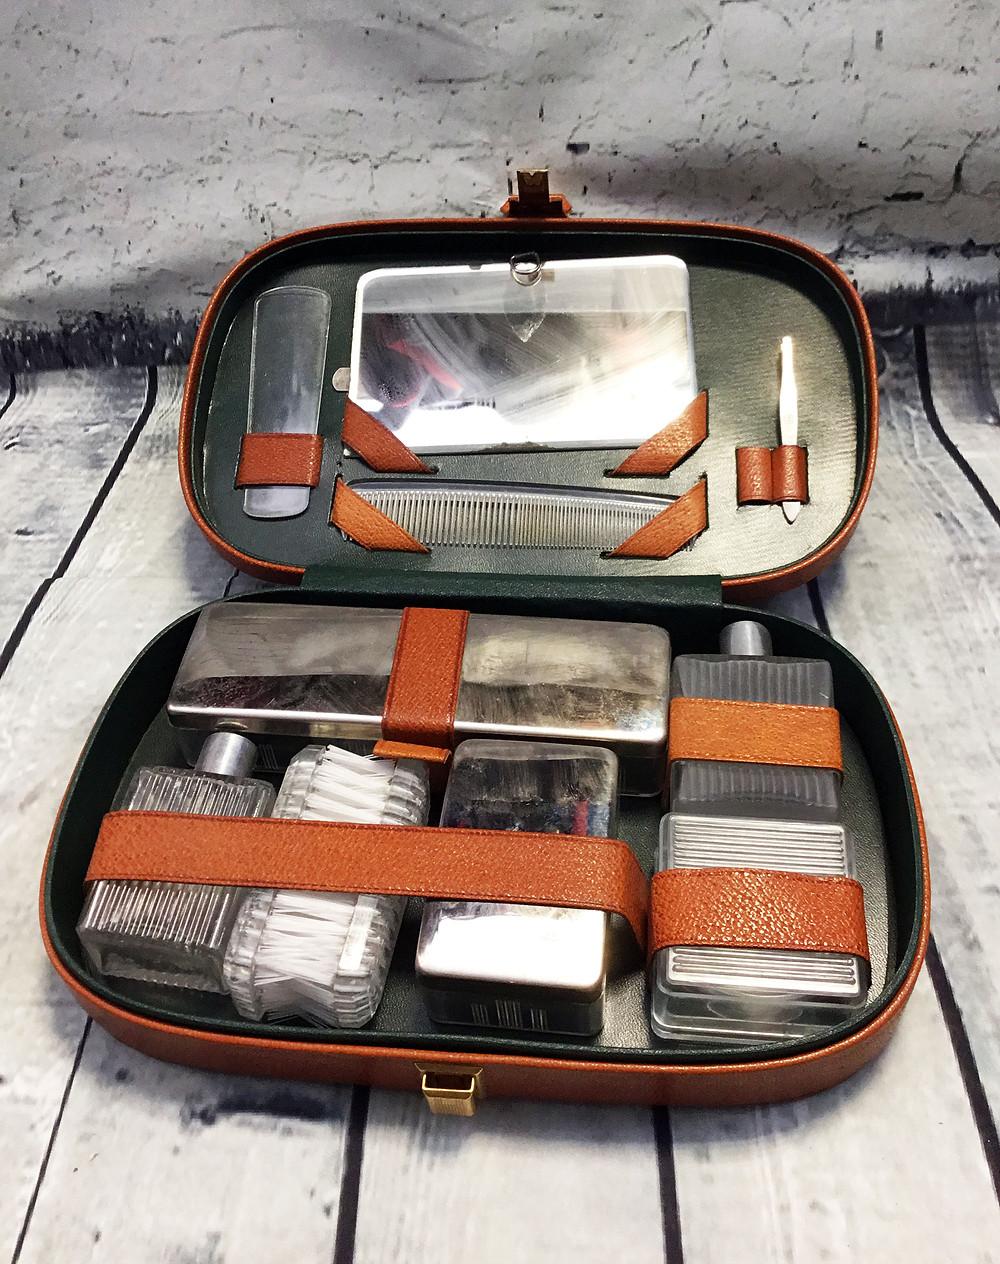 1950s/1960s Vintage Men's Grooming Set in Tan Leather Case